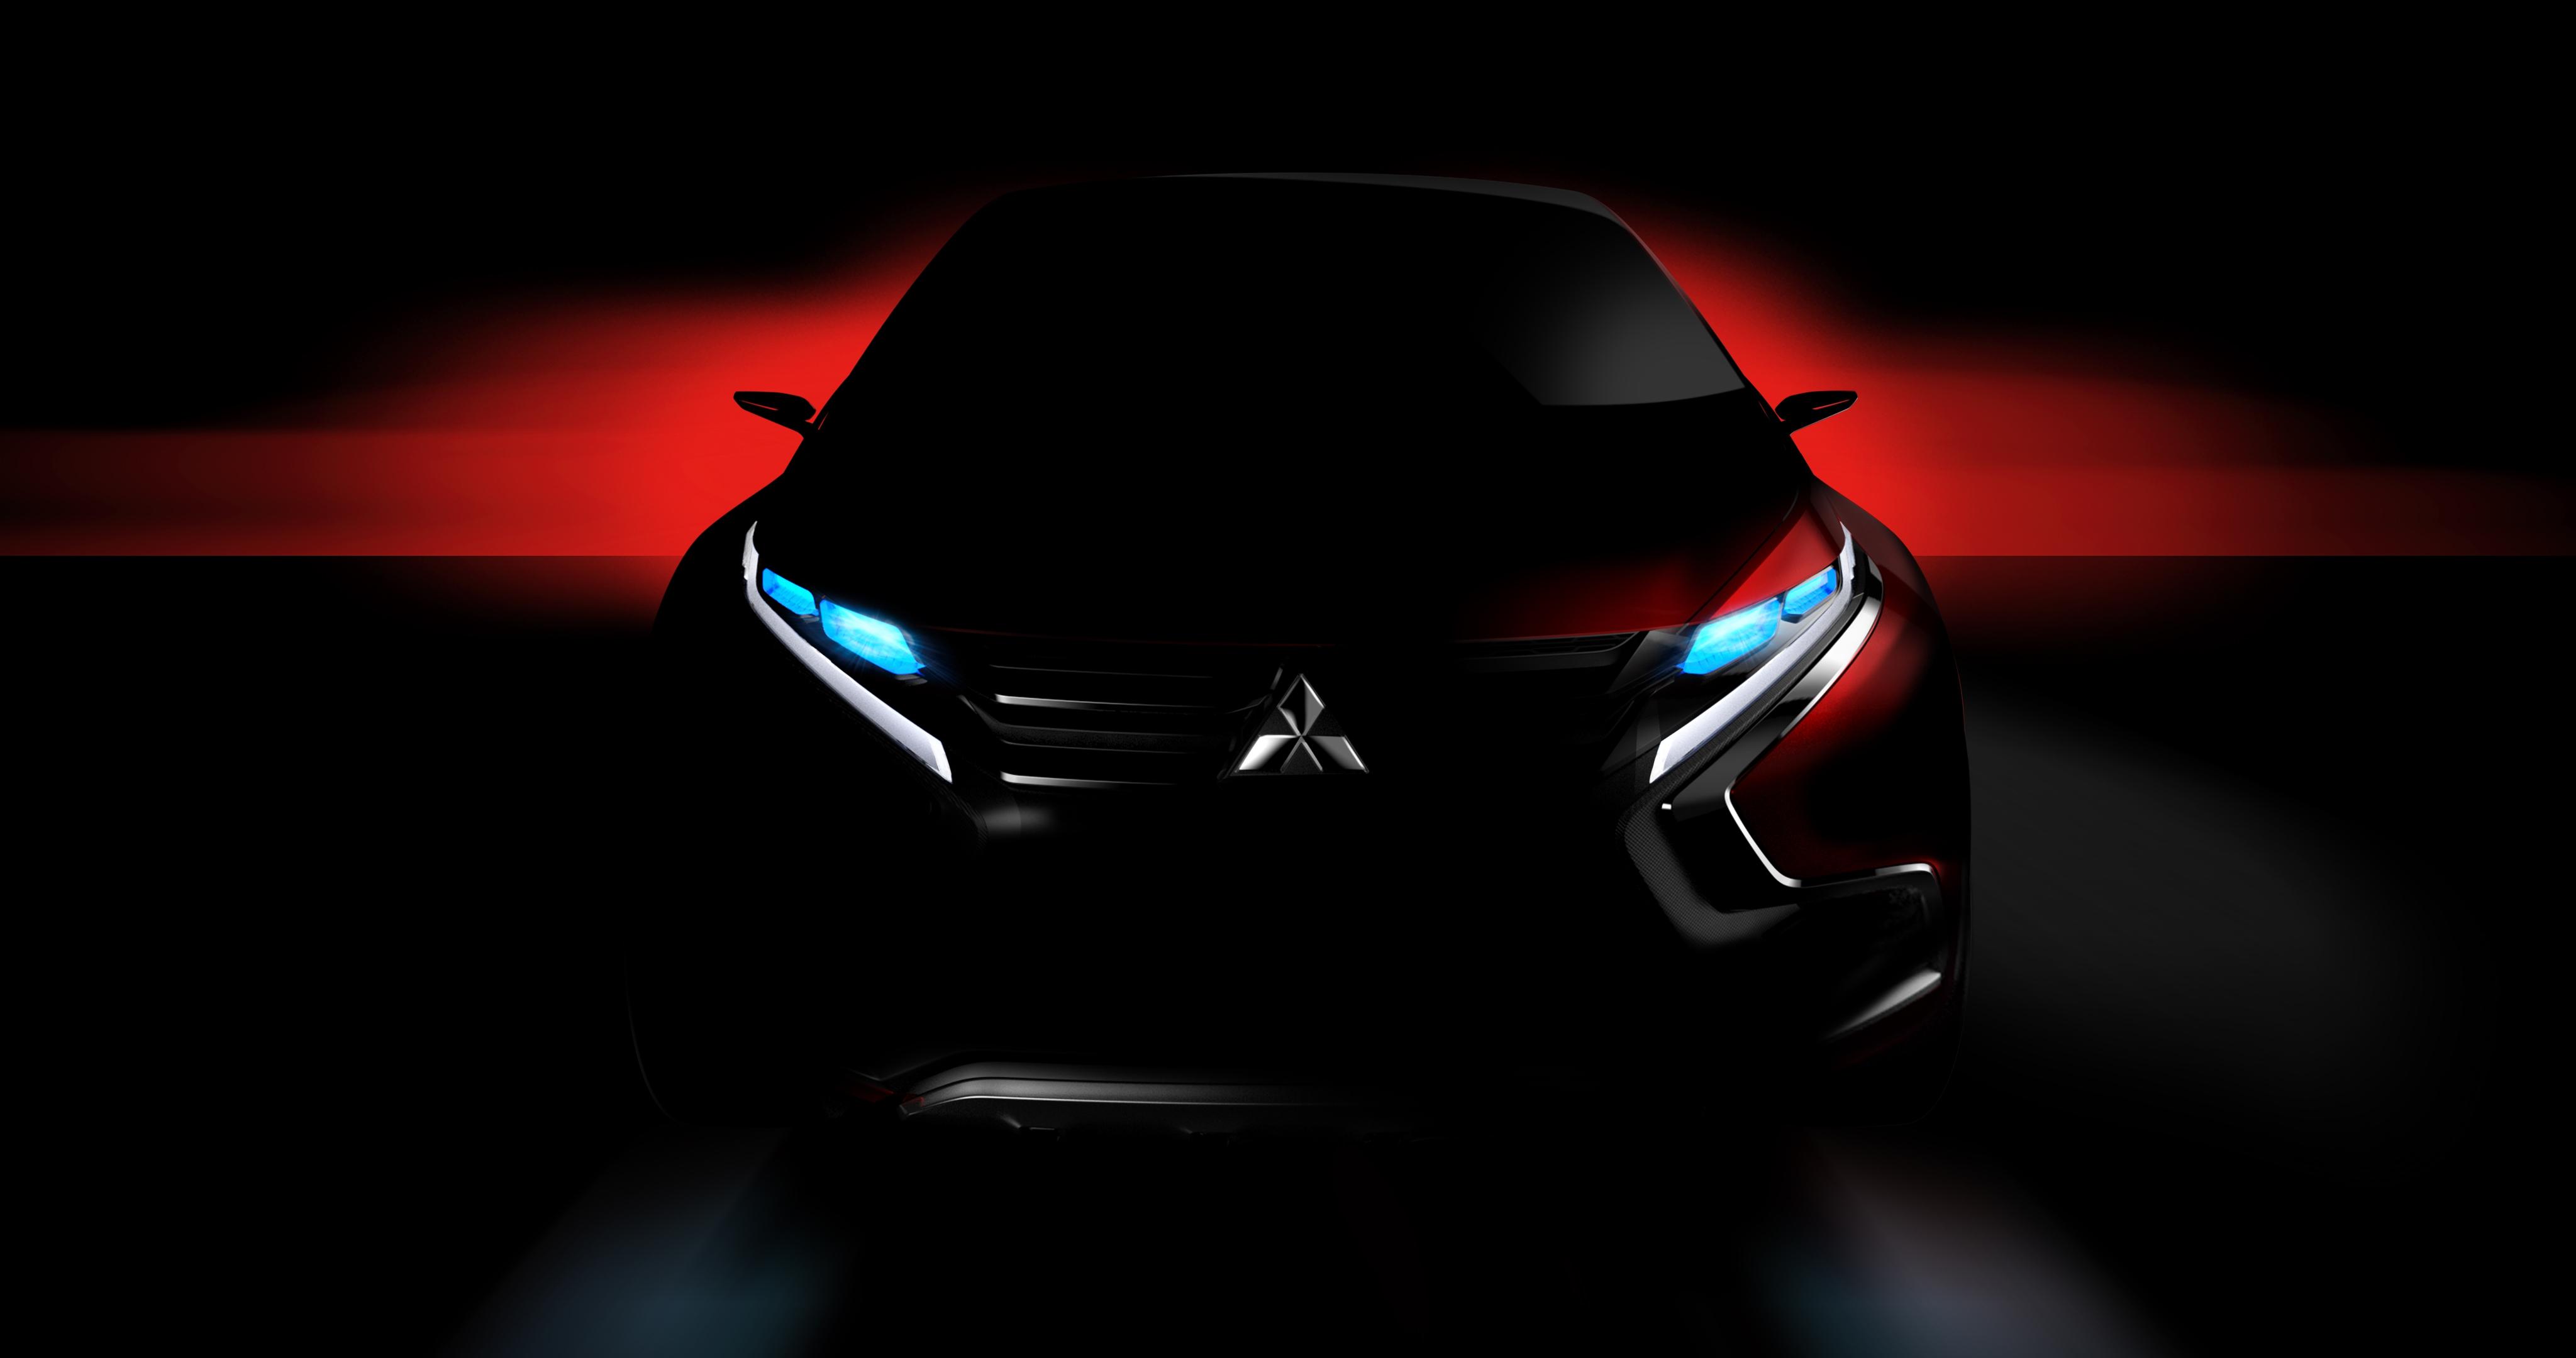 2015 GMS - concept car preview - front.jpg